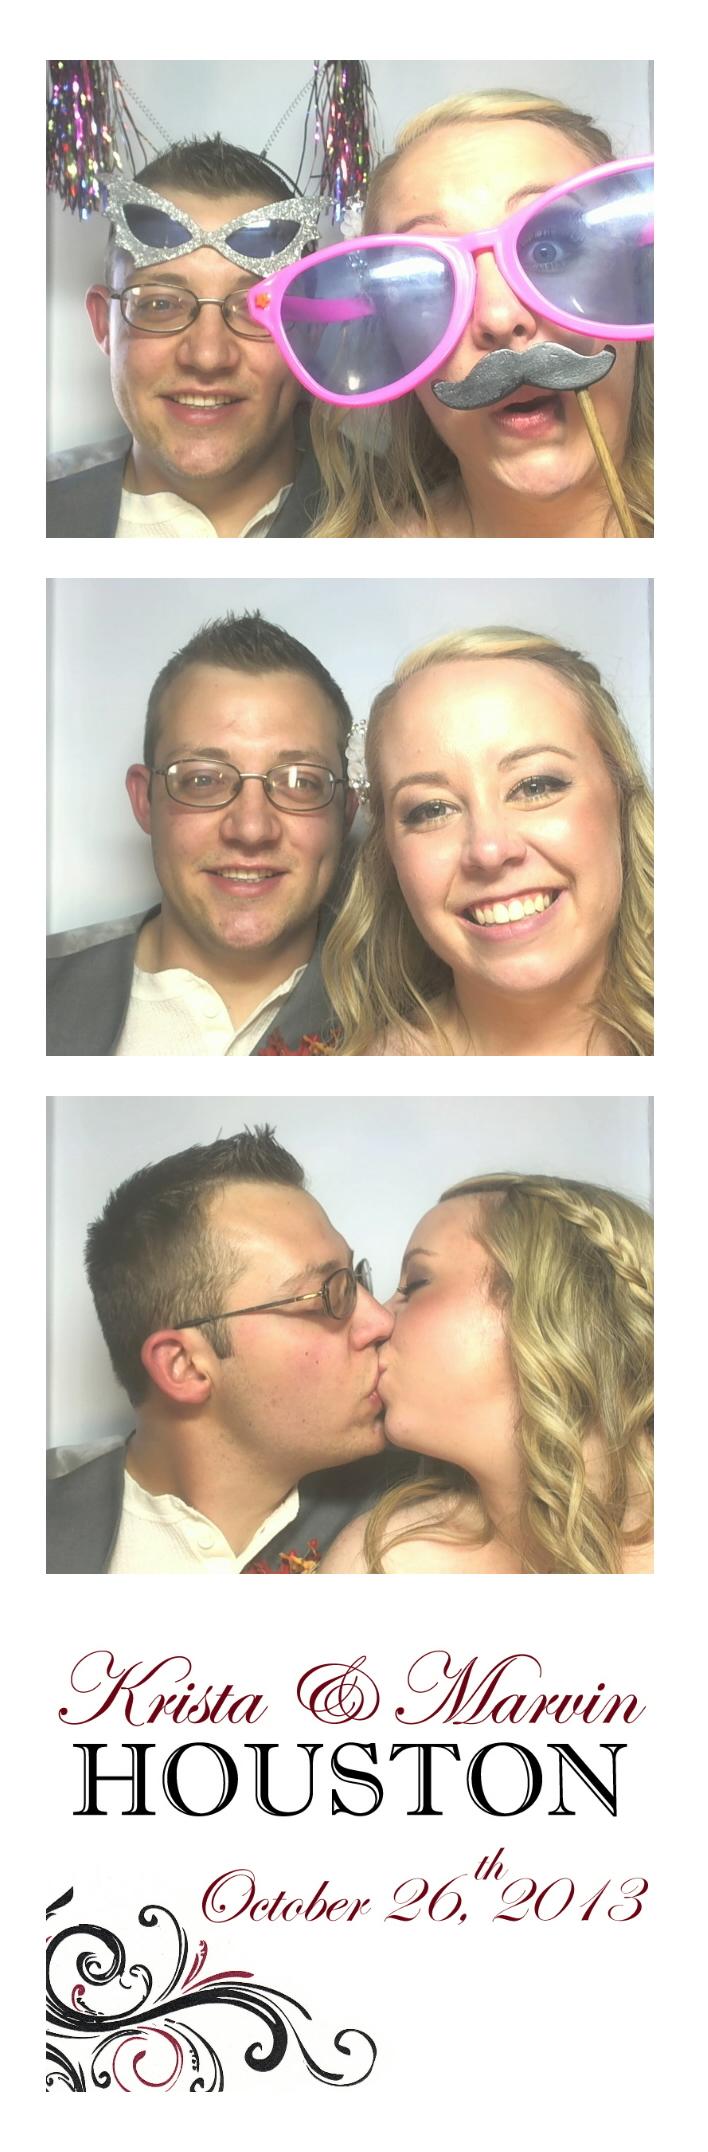 Bride-and-Groom-Houston-10-26-20131